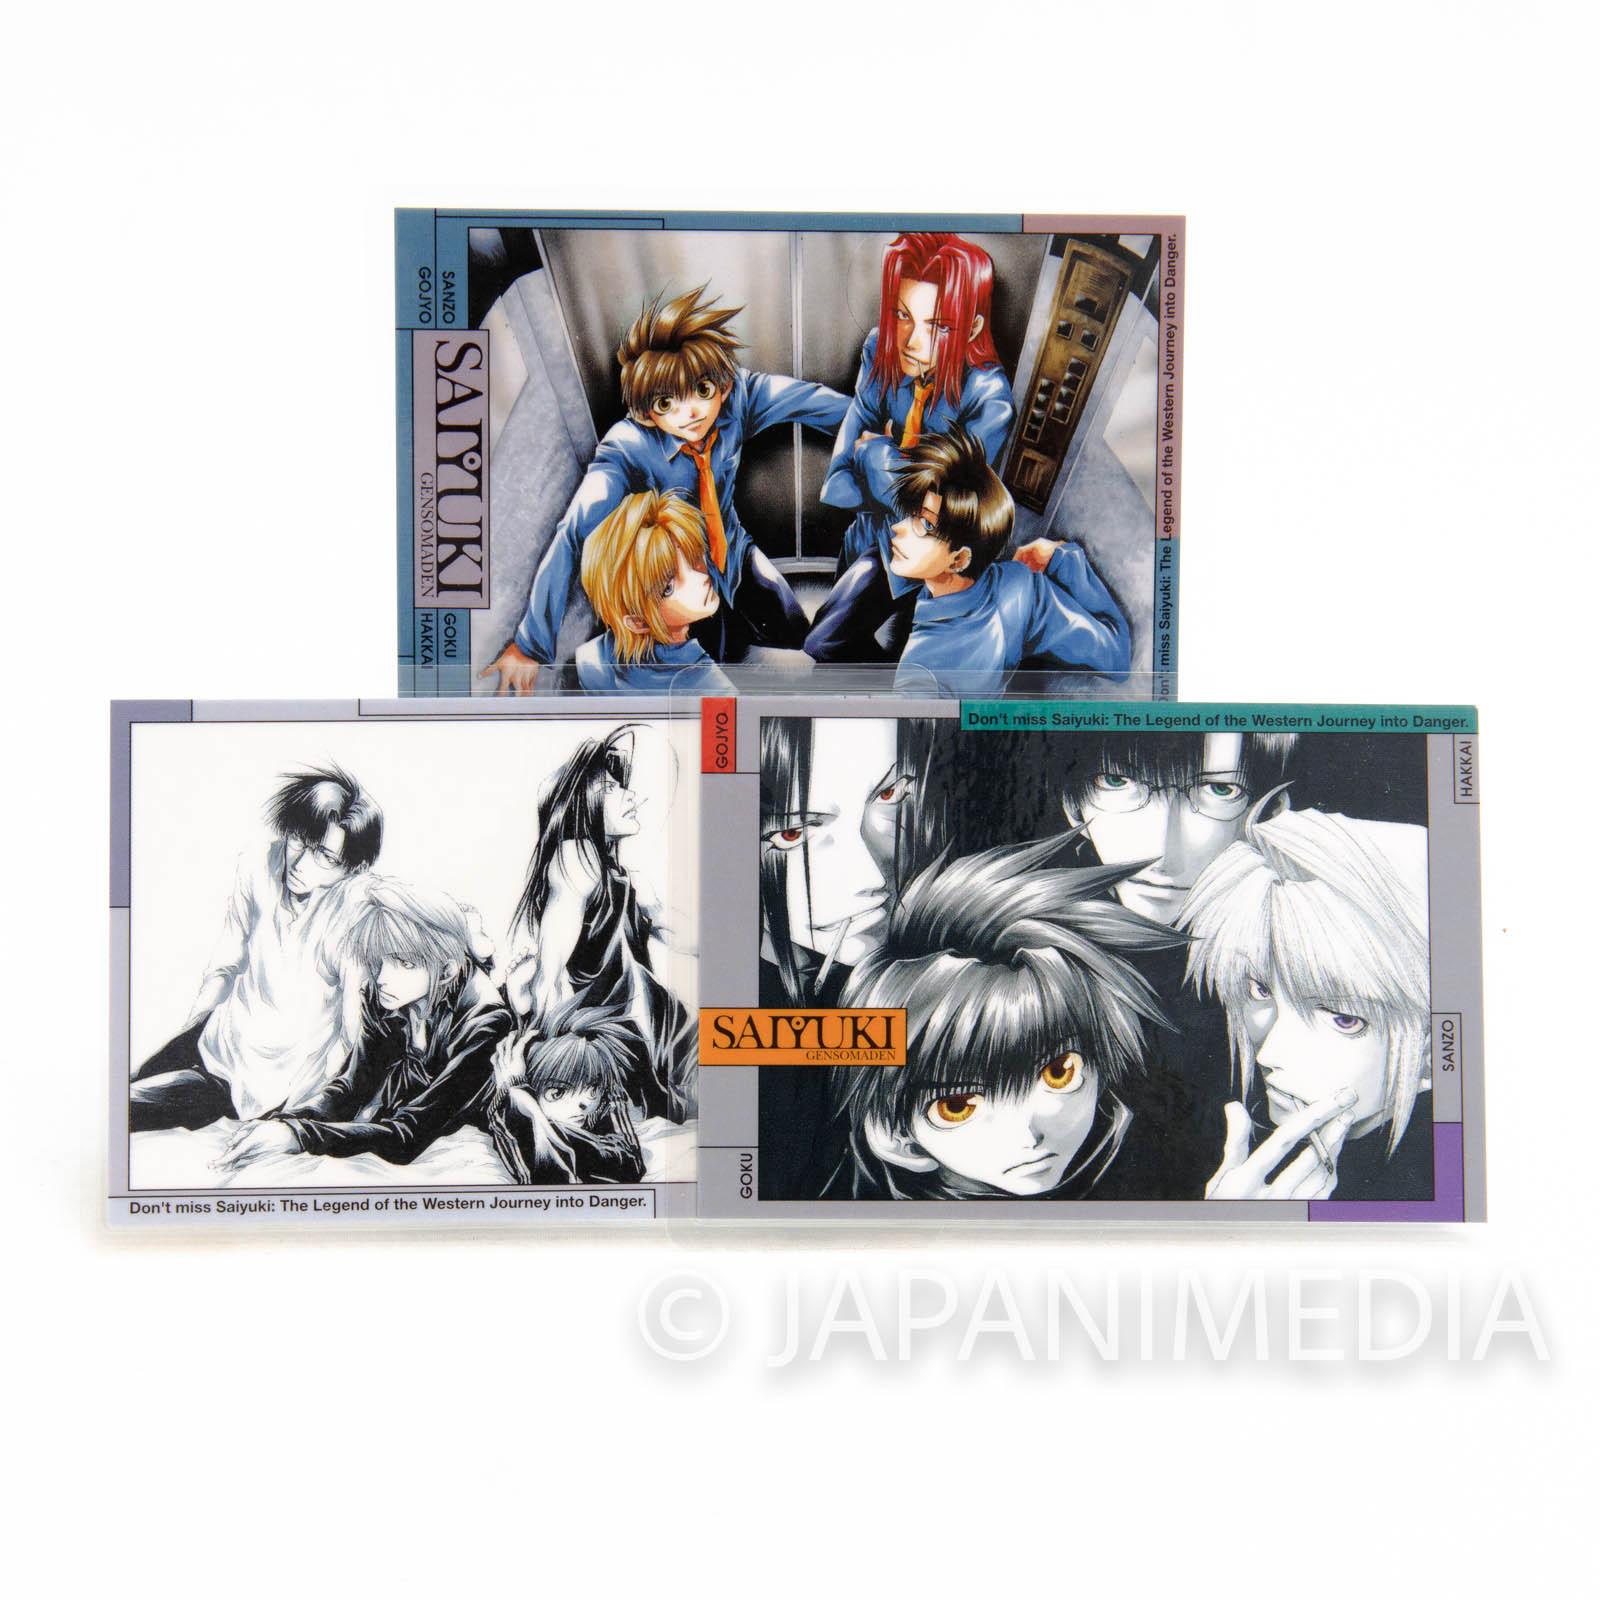 SAIYUKI Laminate cards 3pc Set [Sanzo / Goku / Gojyo / Hakkai] Kazuya Minekura JAPAN ANIME